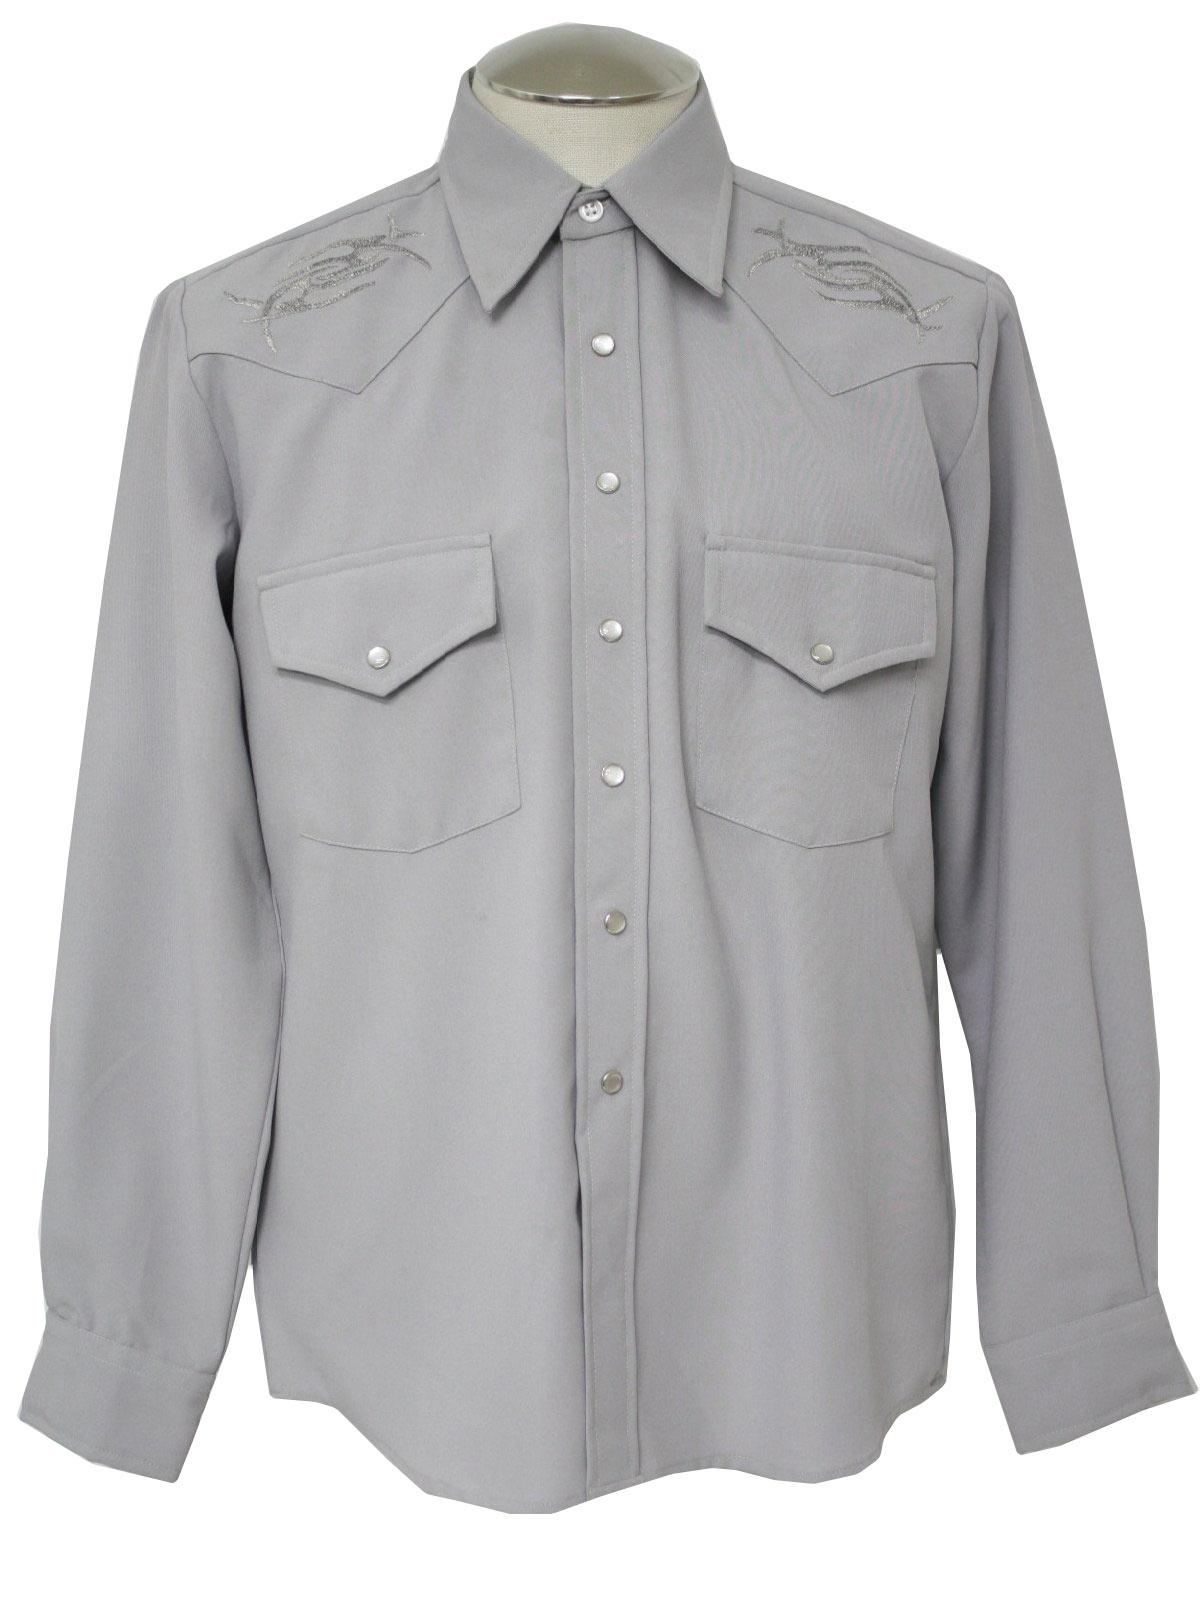 1980 S Western Shirt Kennington But Missing Label 80s